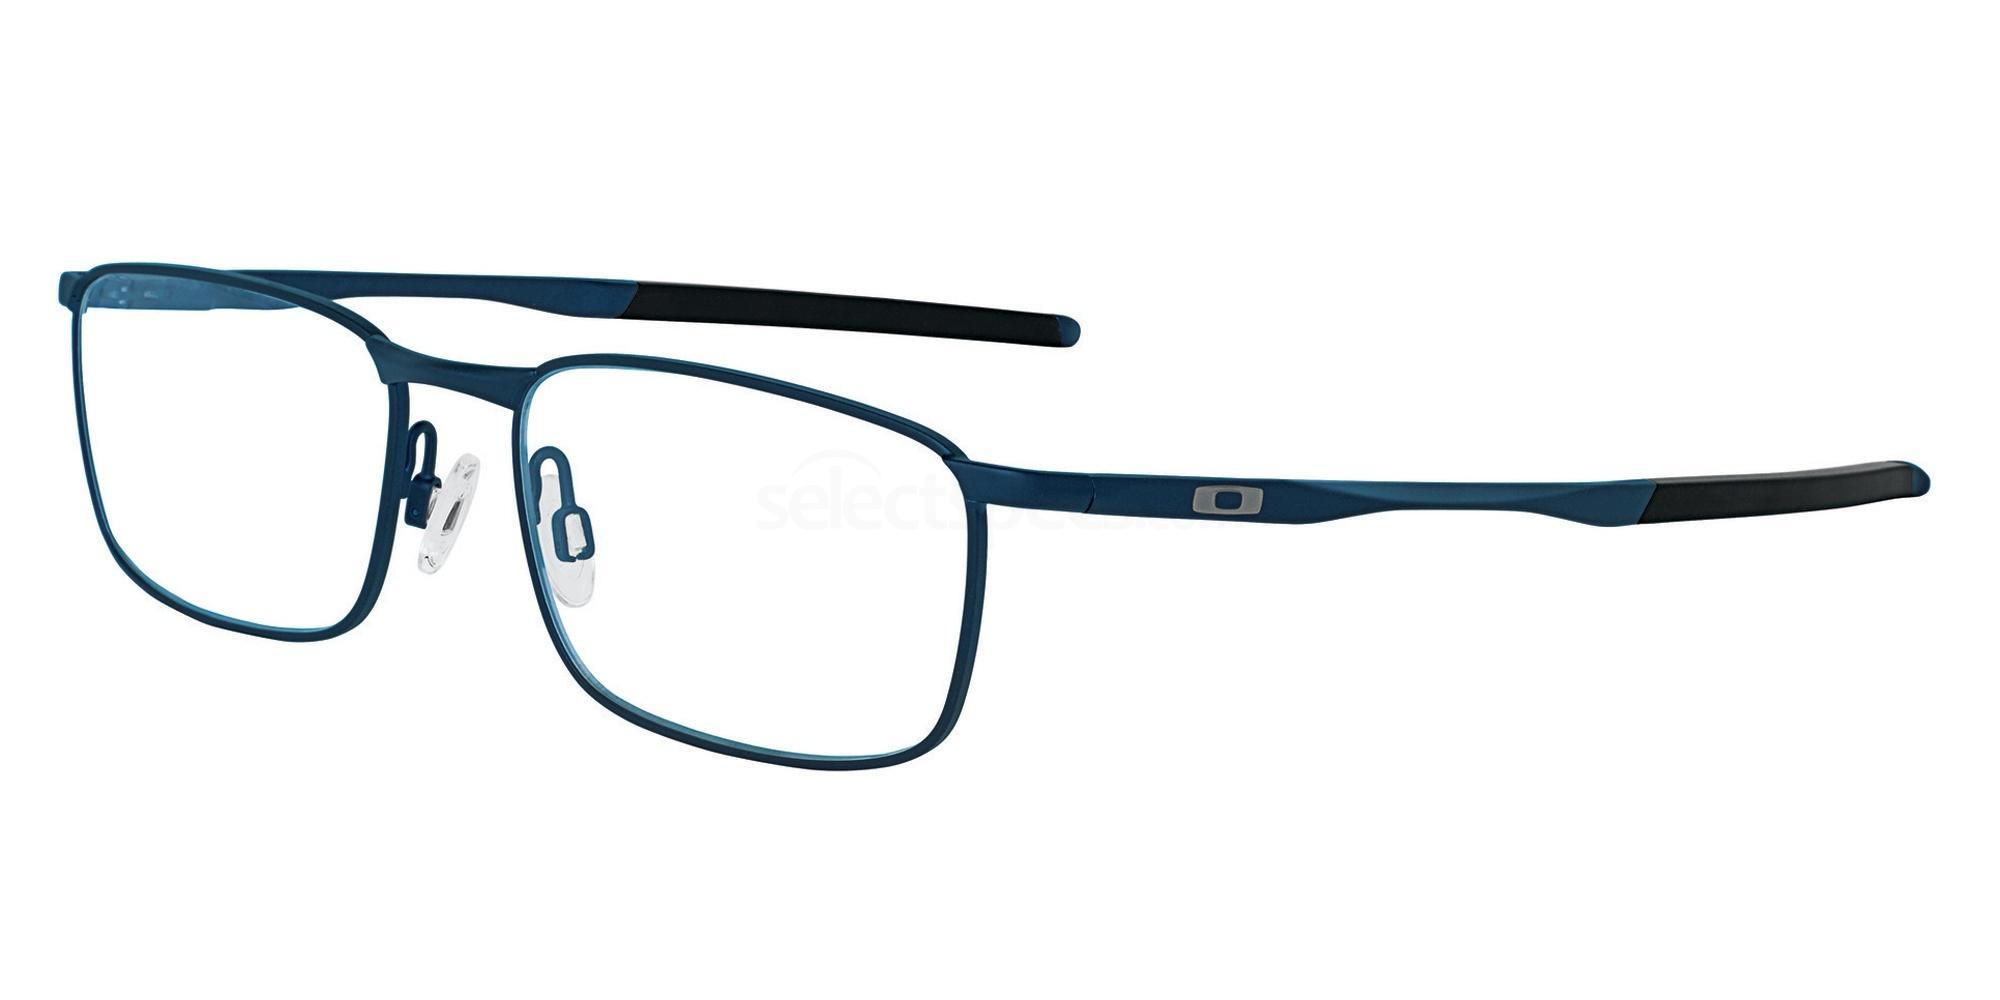 317304 OX3173 BARRELHOUSE Glasses, Oakley